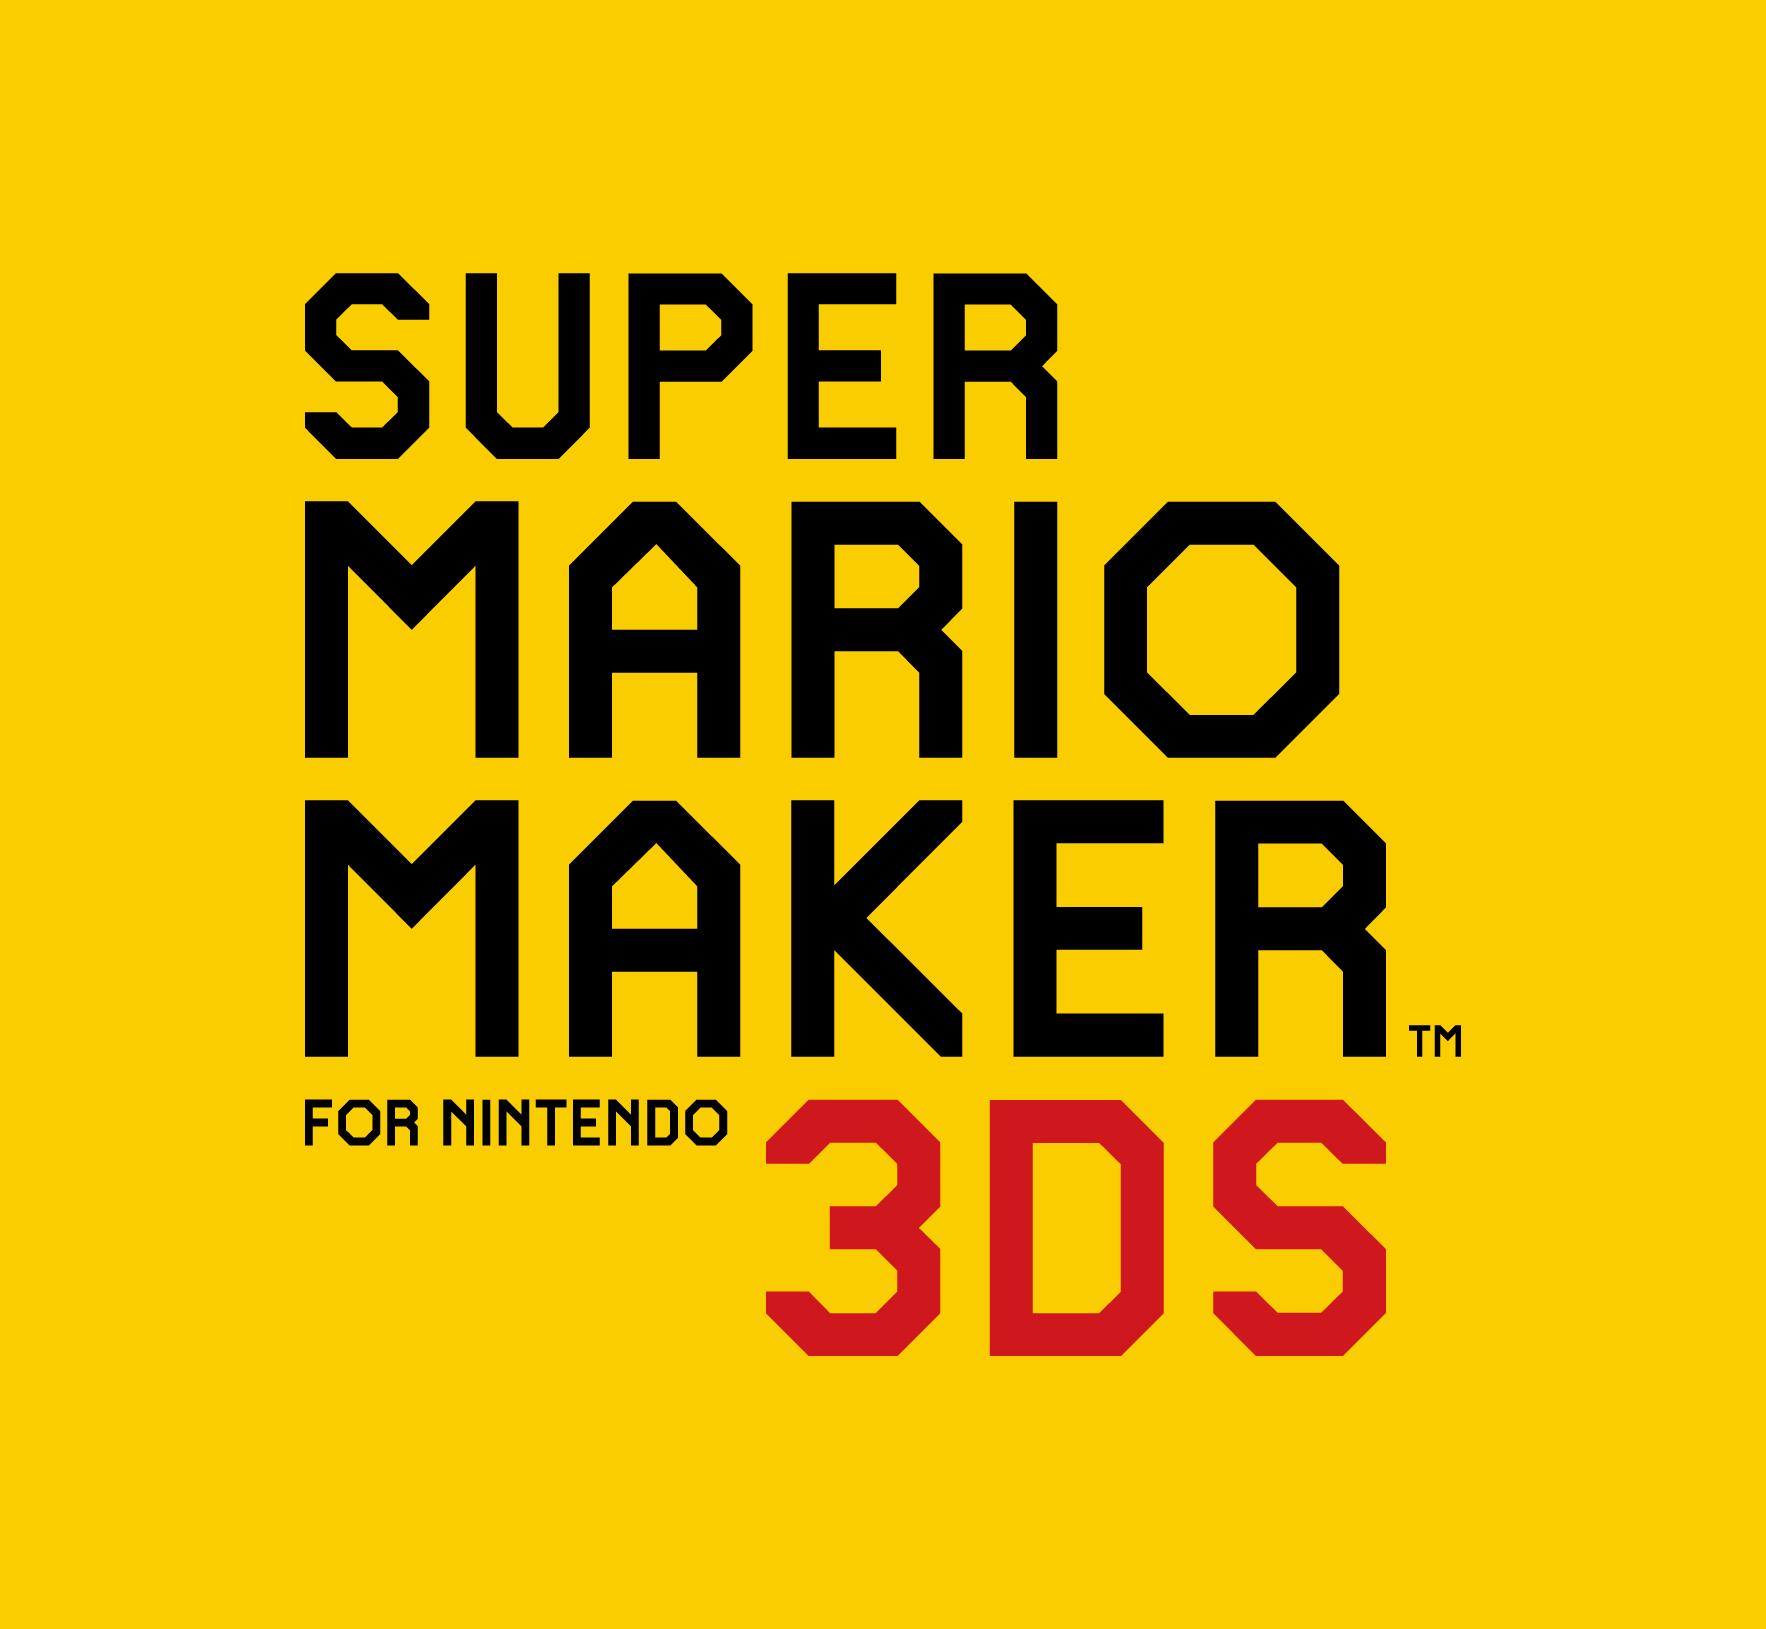 3ds_supermariomakerfornintendo3ds_logo_02